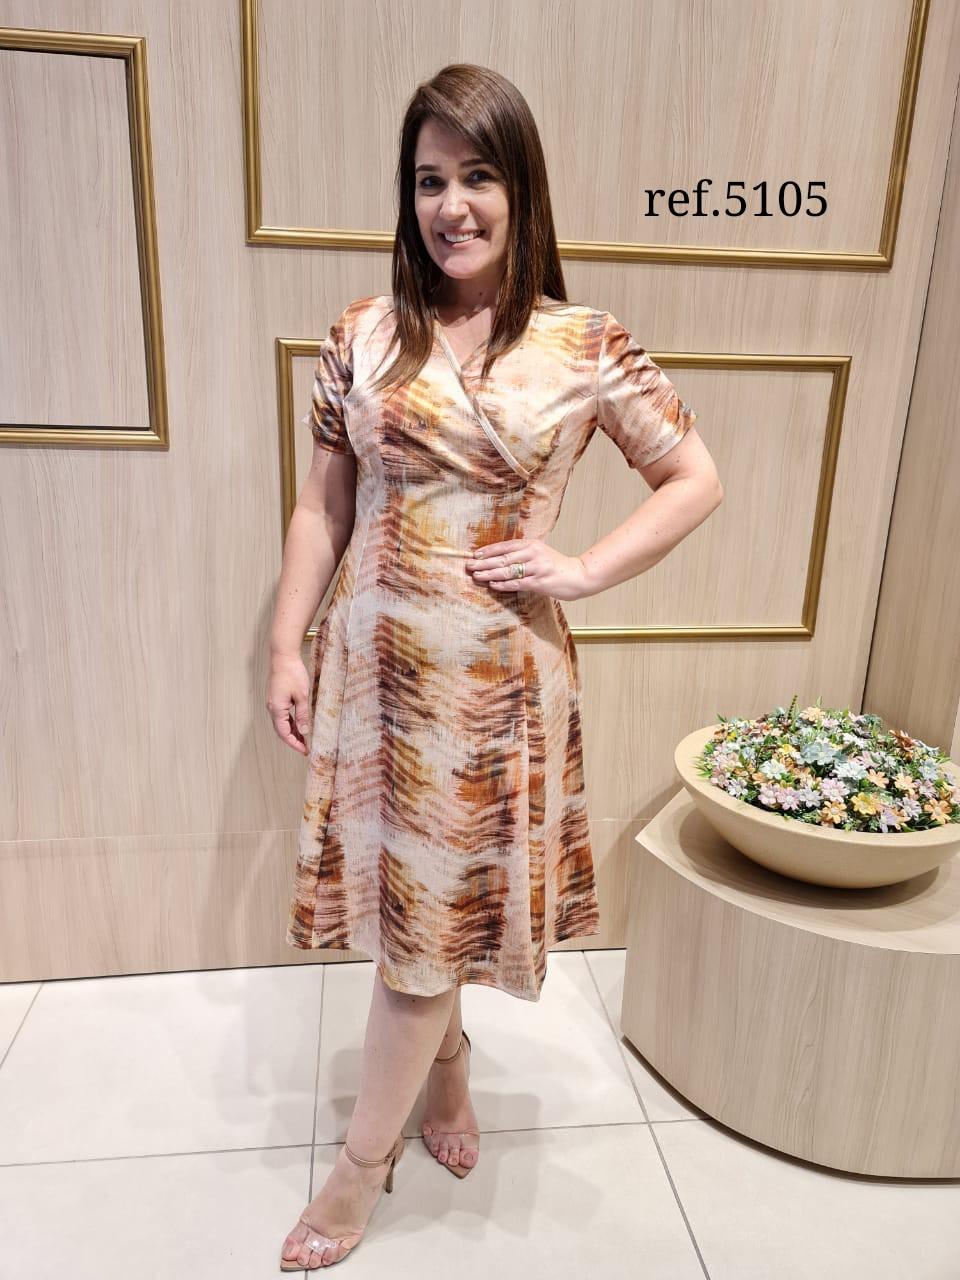 Vestido Em Neoprene - Moda Evangélica Cechiq (5105 T)